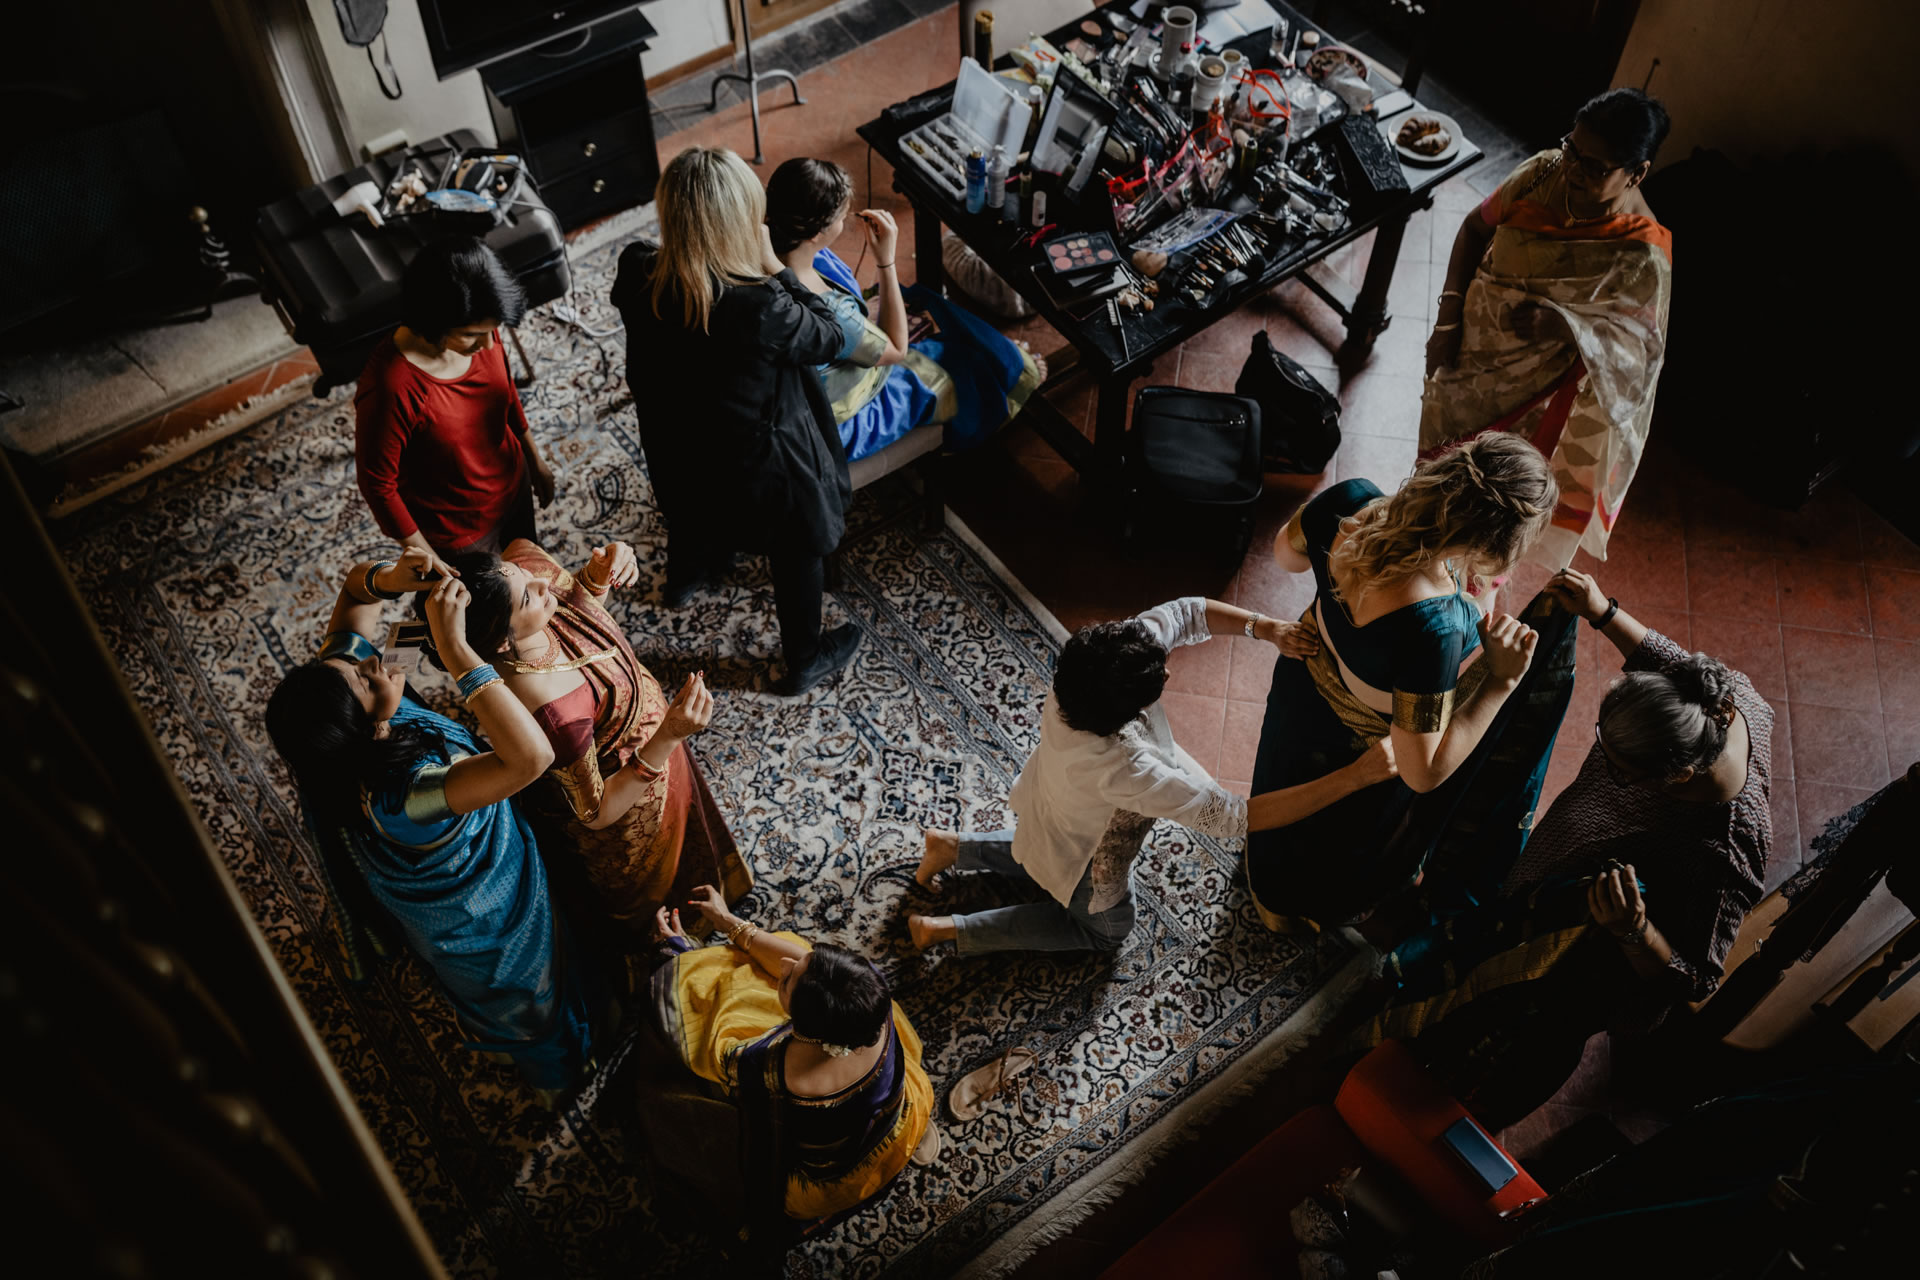 - 2 :: Indian wedding ceremony at Villa Pitiana :: Luxury wedding photography - 1 ::  - 2